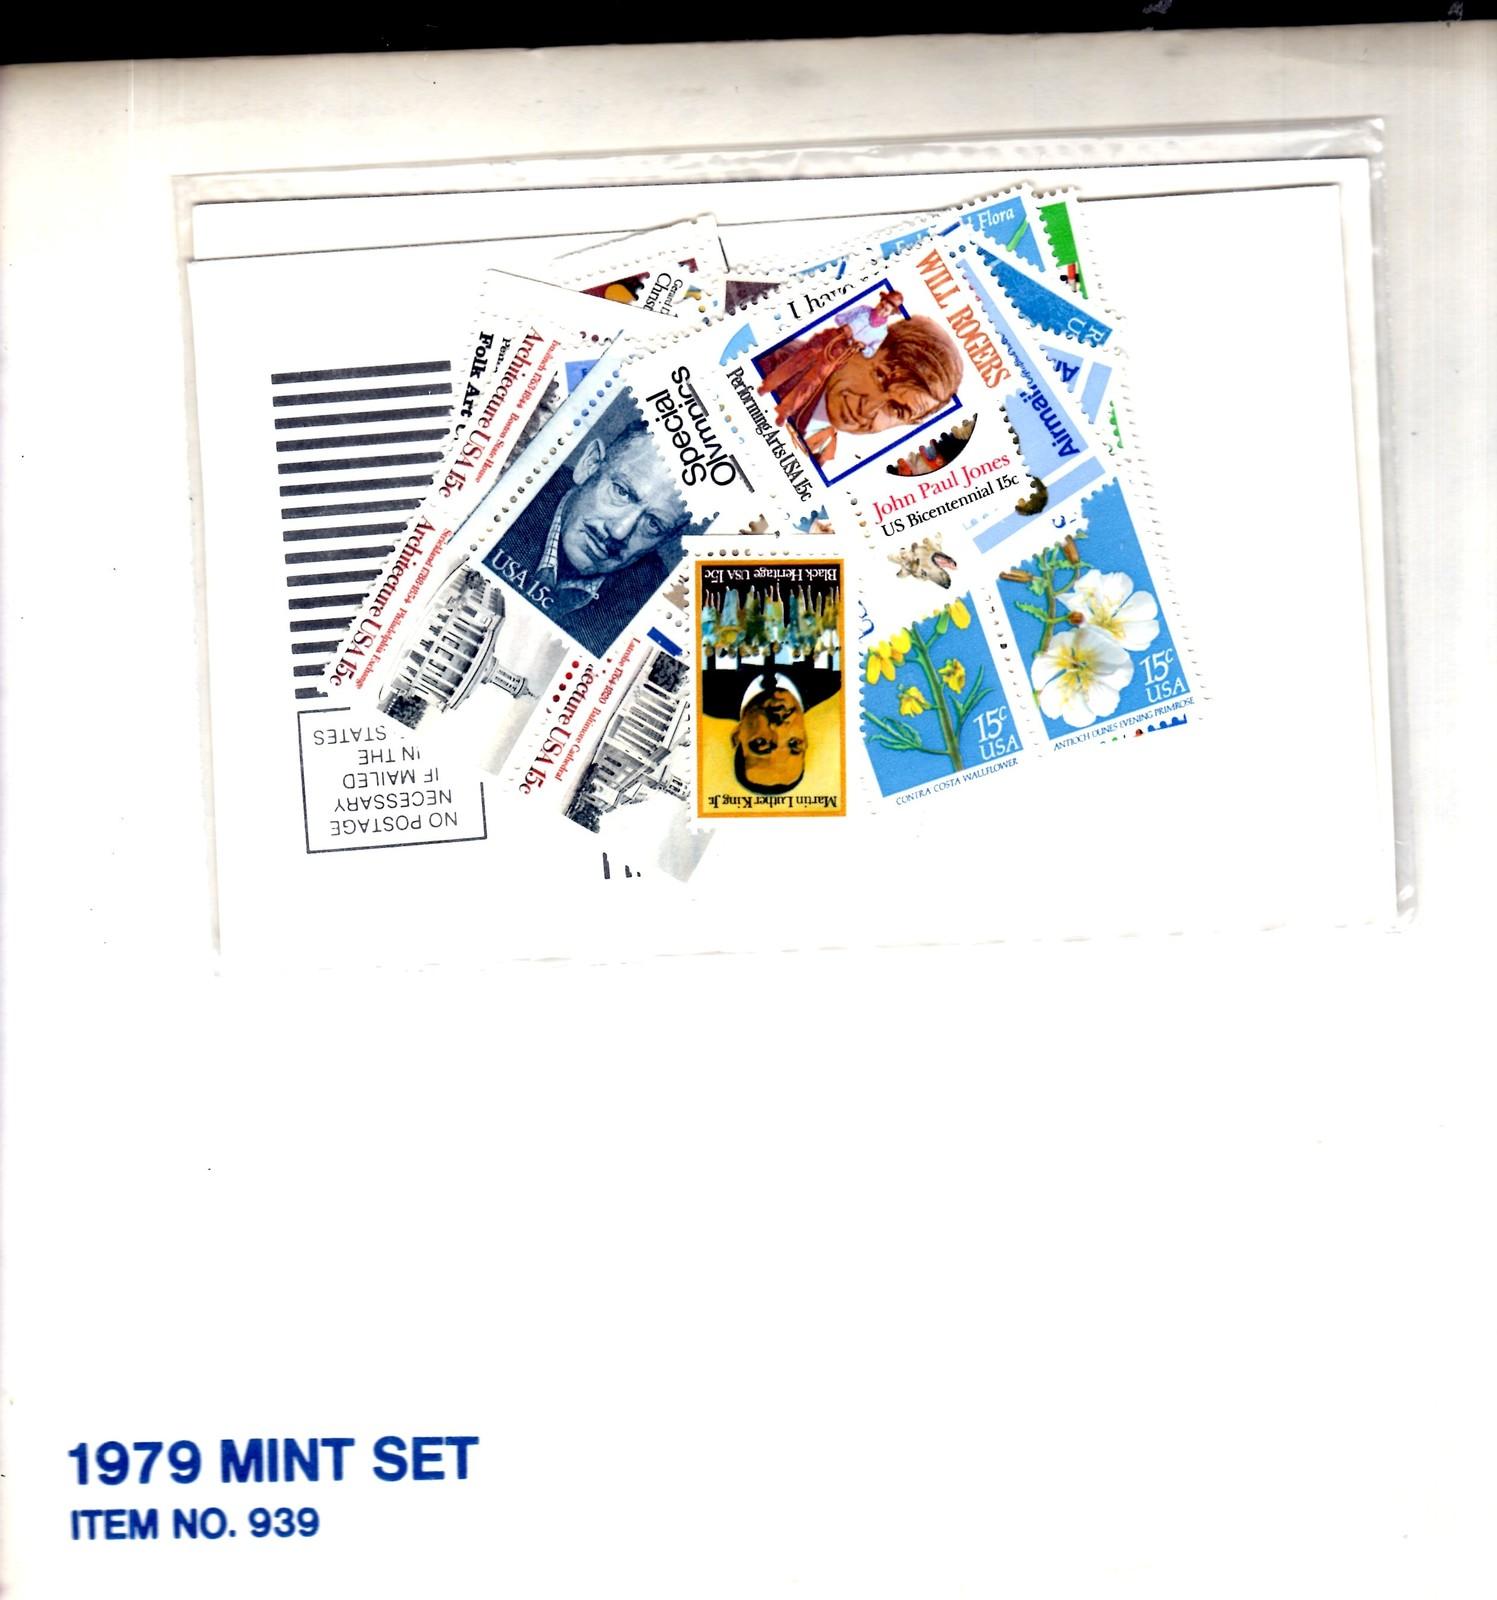 USPS Stamps - 1979 USPS Mint Set of Commemorative Stamps - UNOPENNED